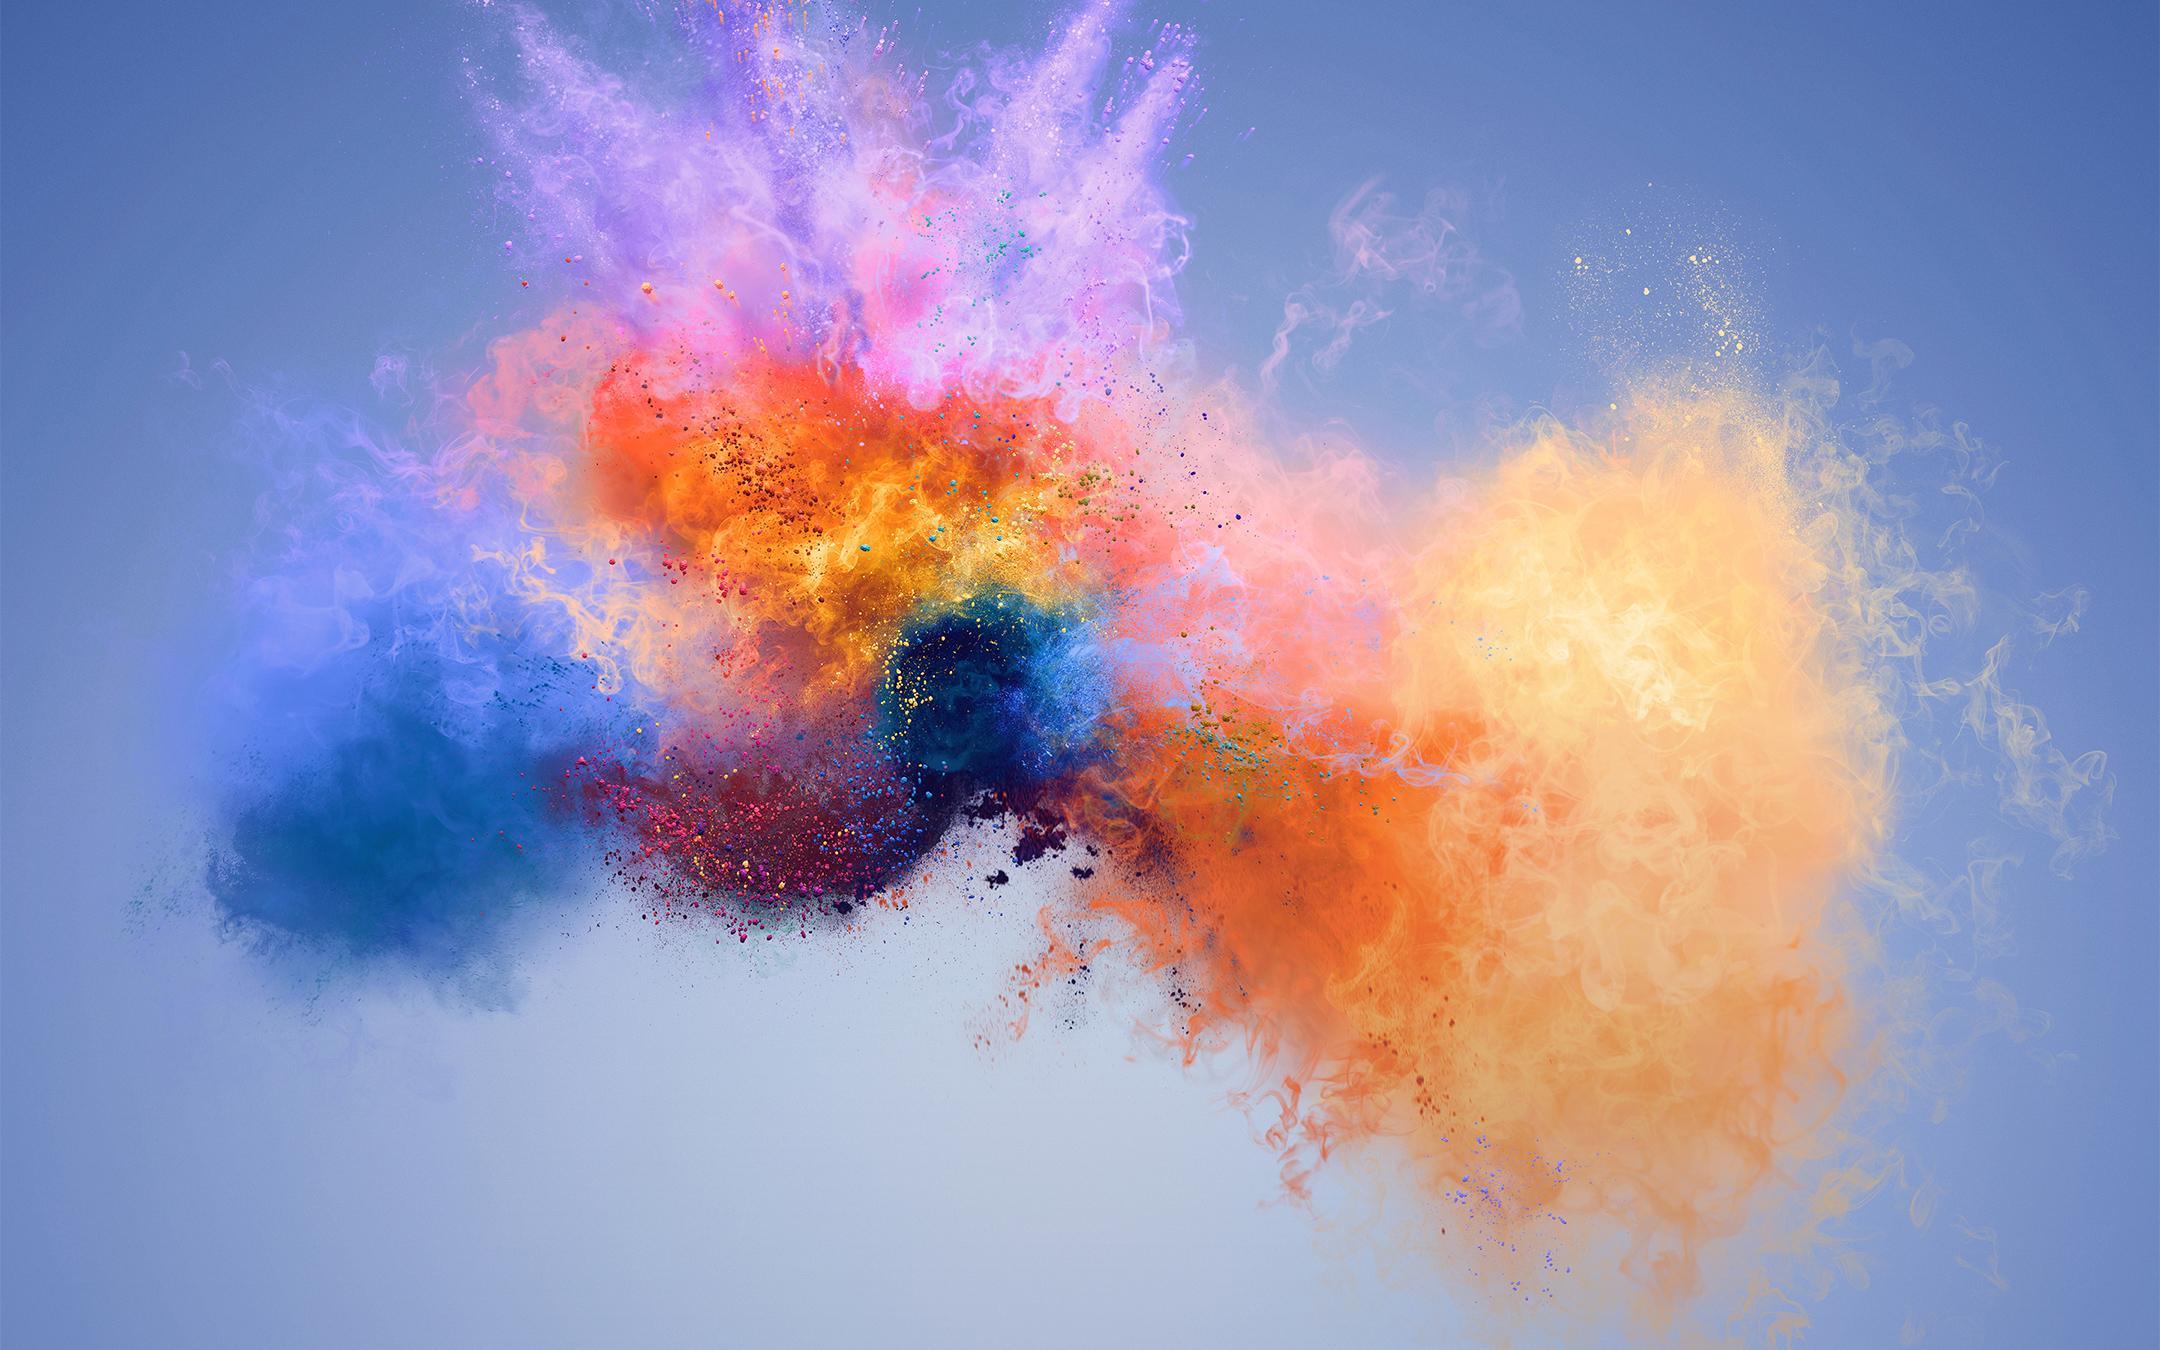 Huawei Wallpaper: Download Colors Huawei Honor 7x Stock 5120x2880 Resolution